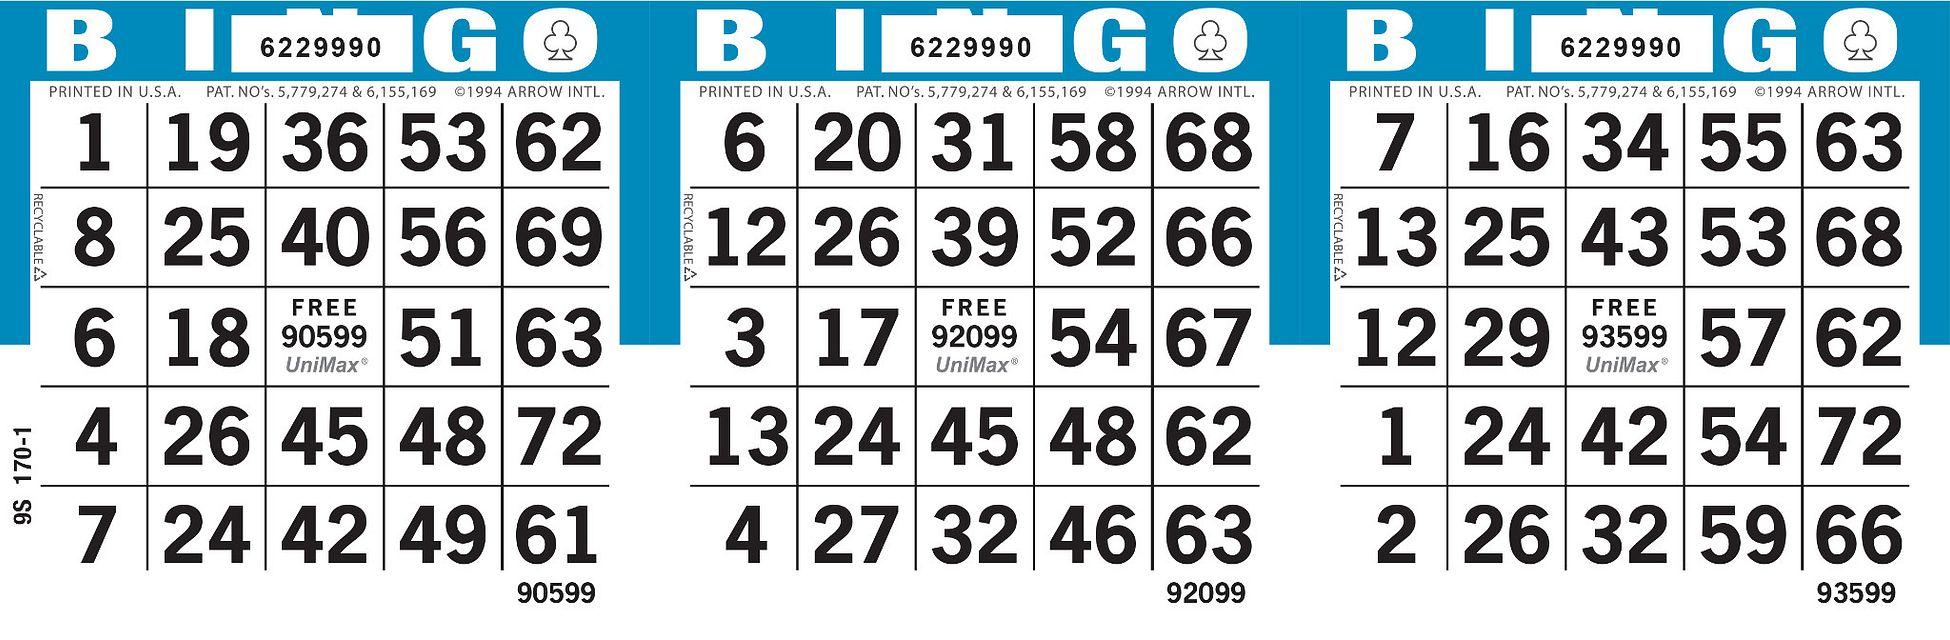 UniMax 3H3 Blue CMKY Bingo Paper/UniMax Cuts/3H Cuts